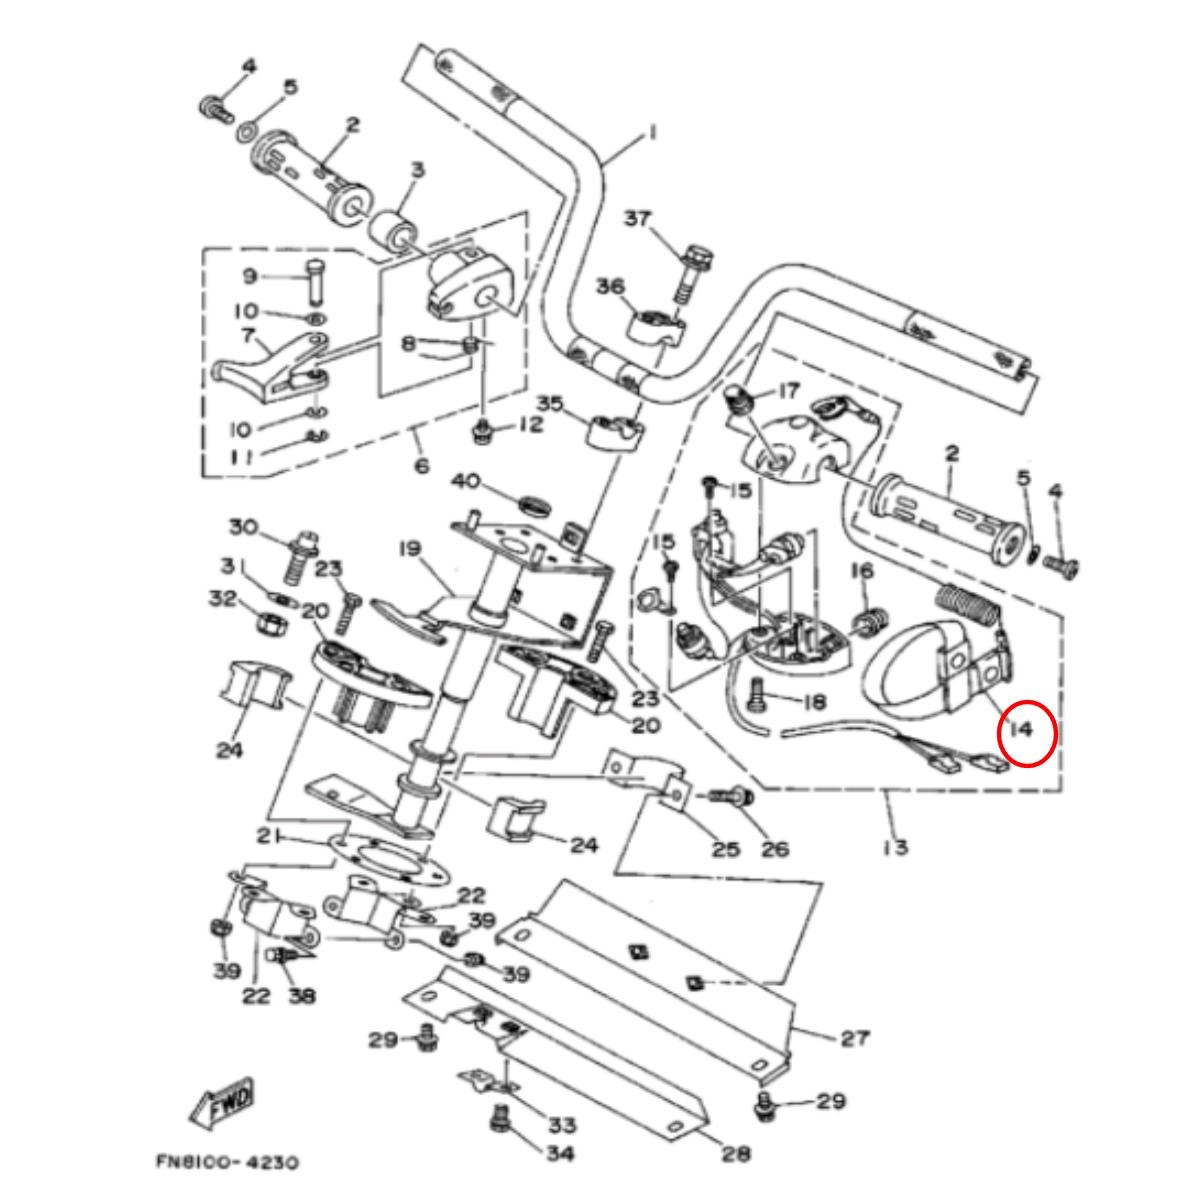 Corta Circuito Motor Popa/Jet Yamaha Cordão  - Radical Peças - Peças para Jet Ski